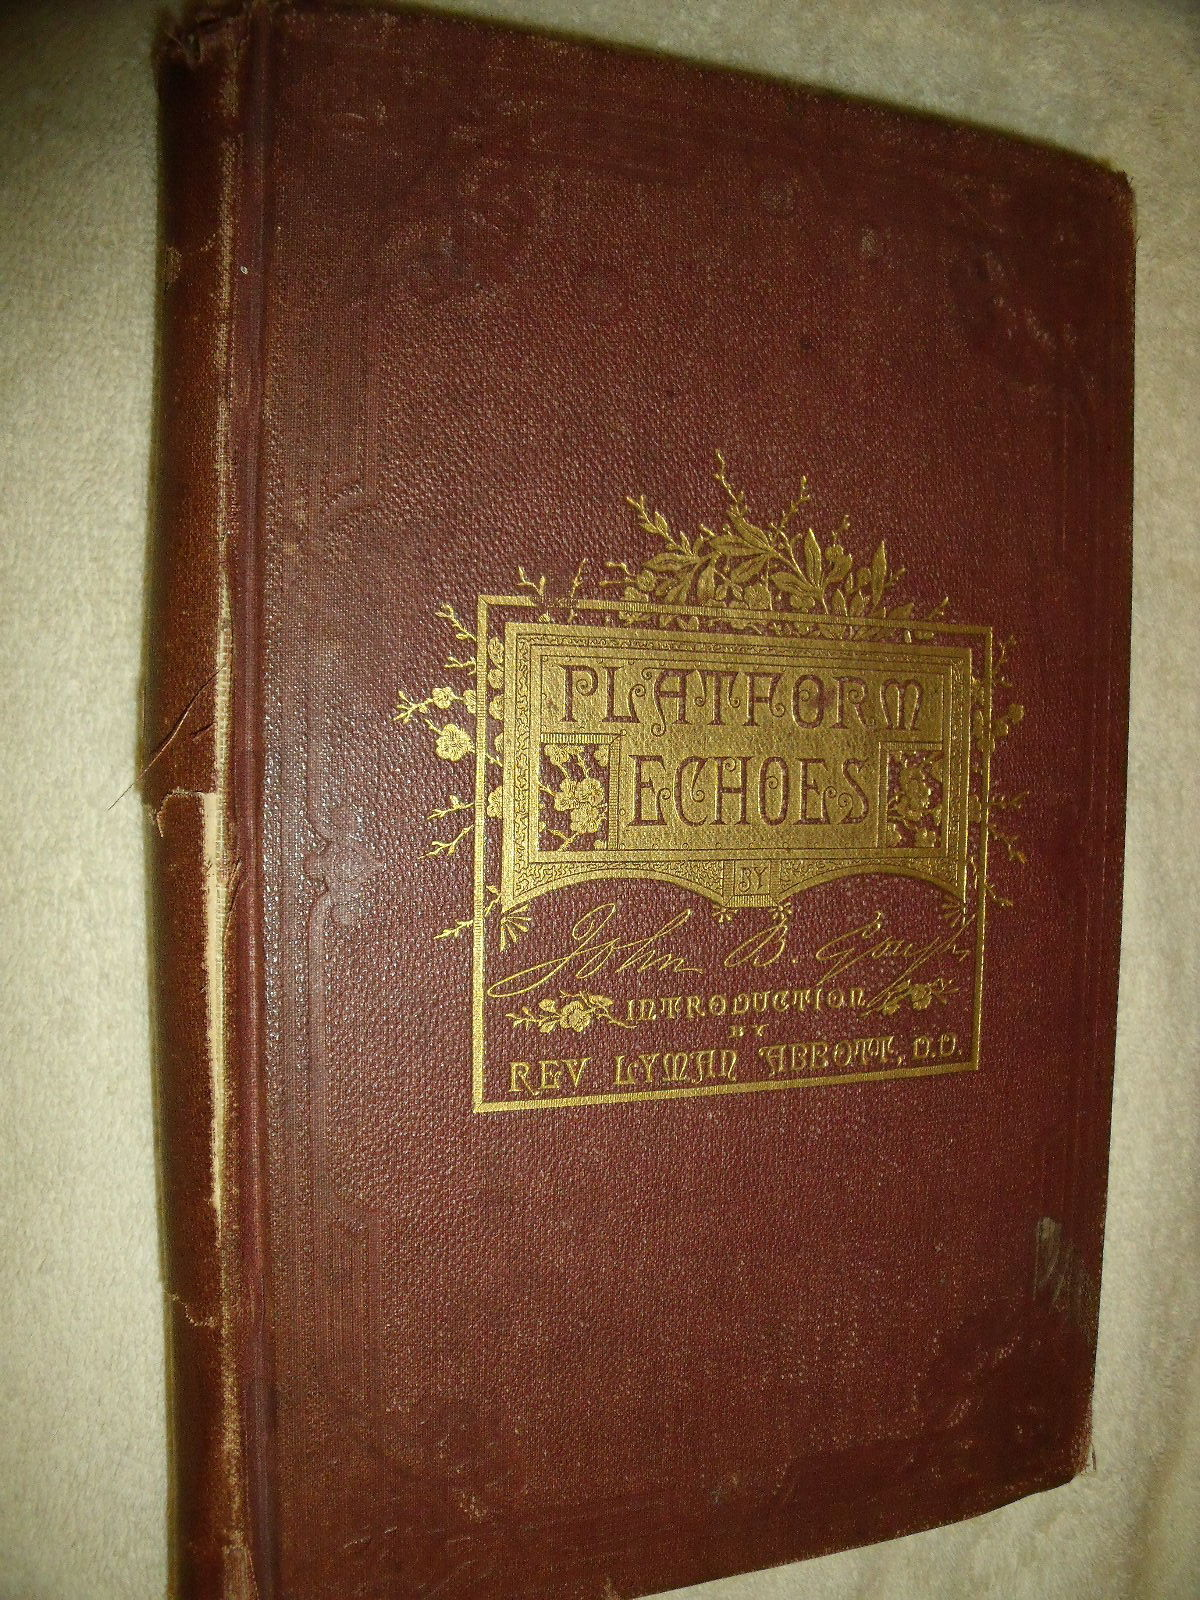 ebook John Shaw's